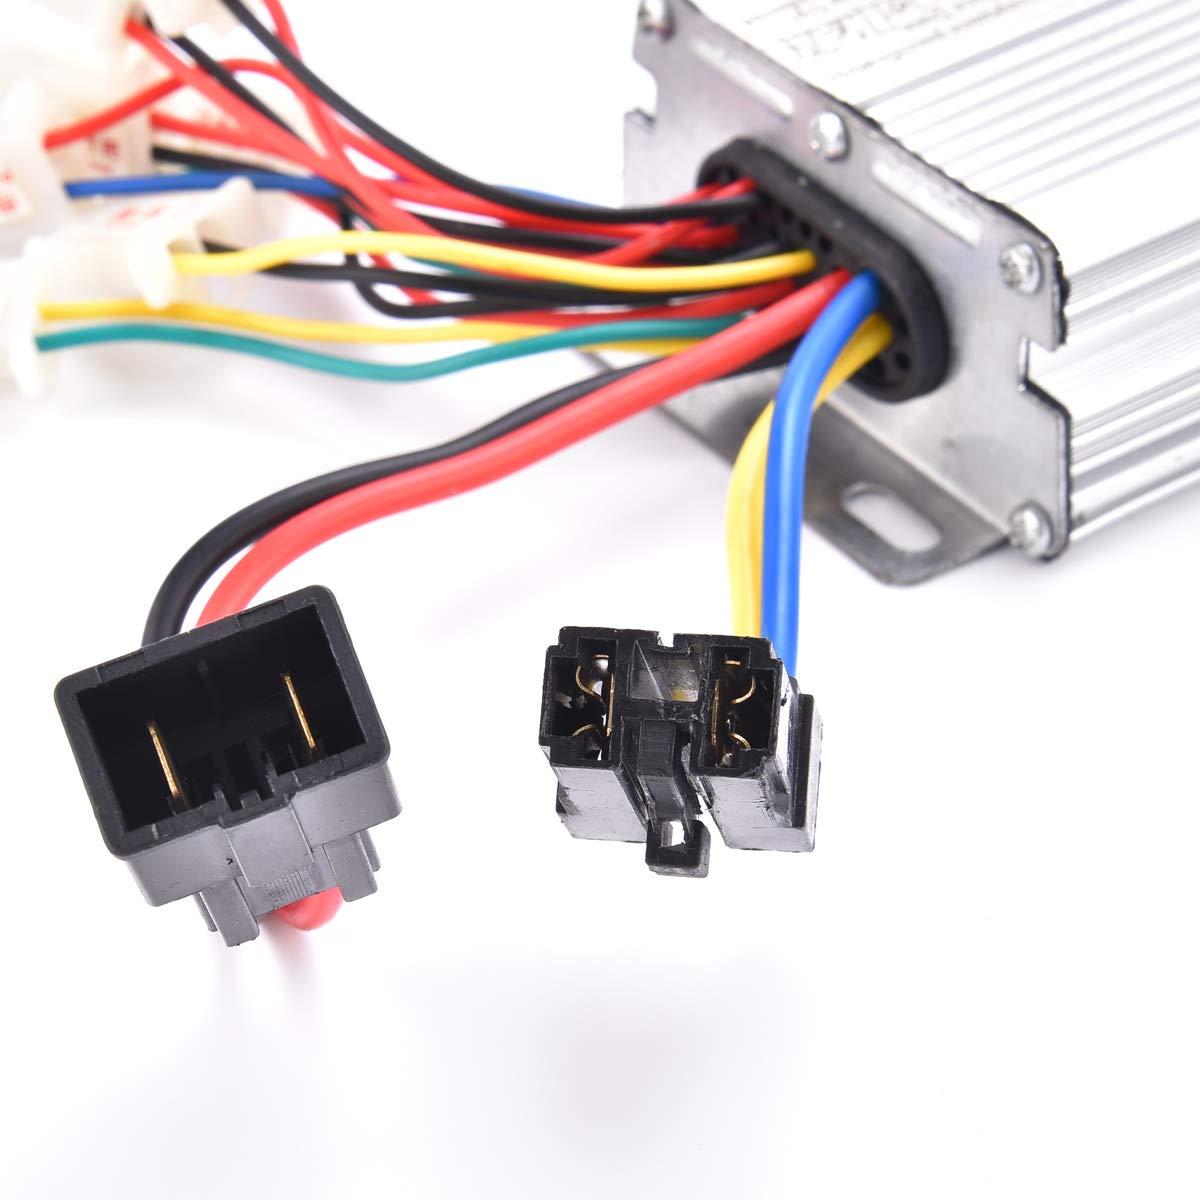 Amazon.com: Wingsmoto - Controlador de motor eléctrico ...